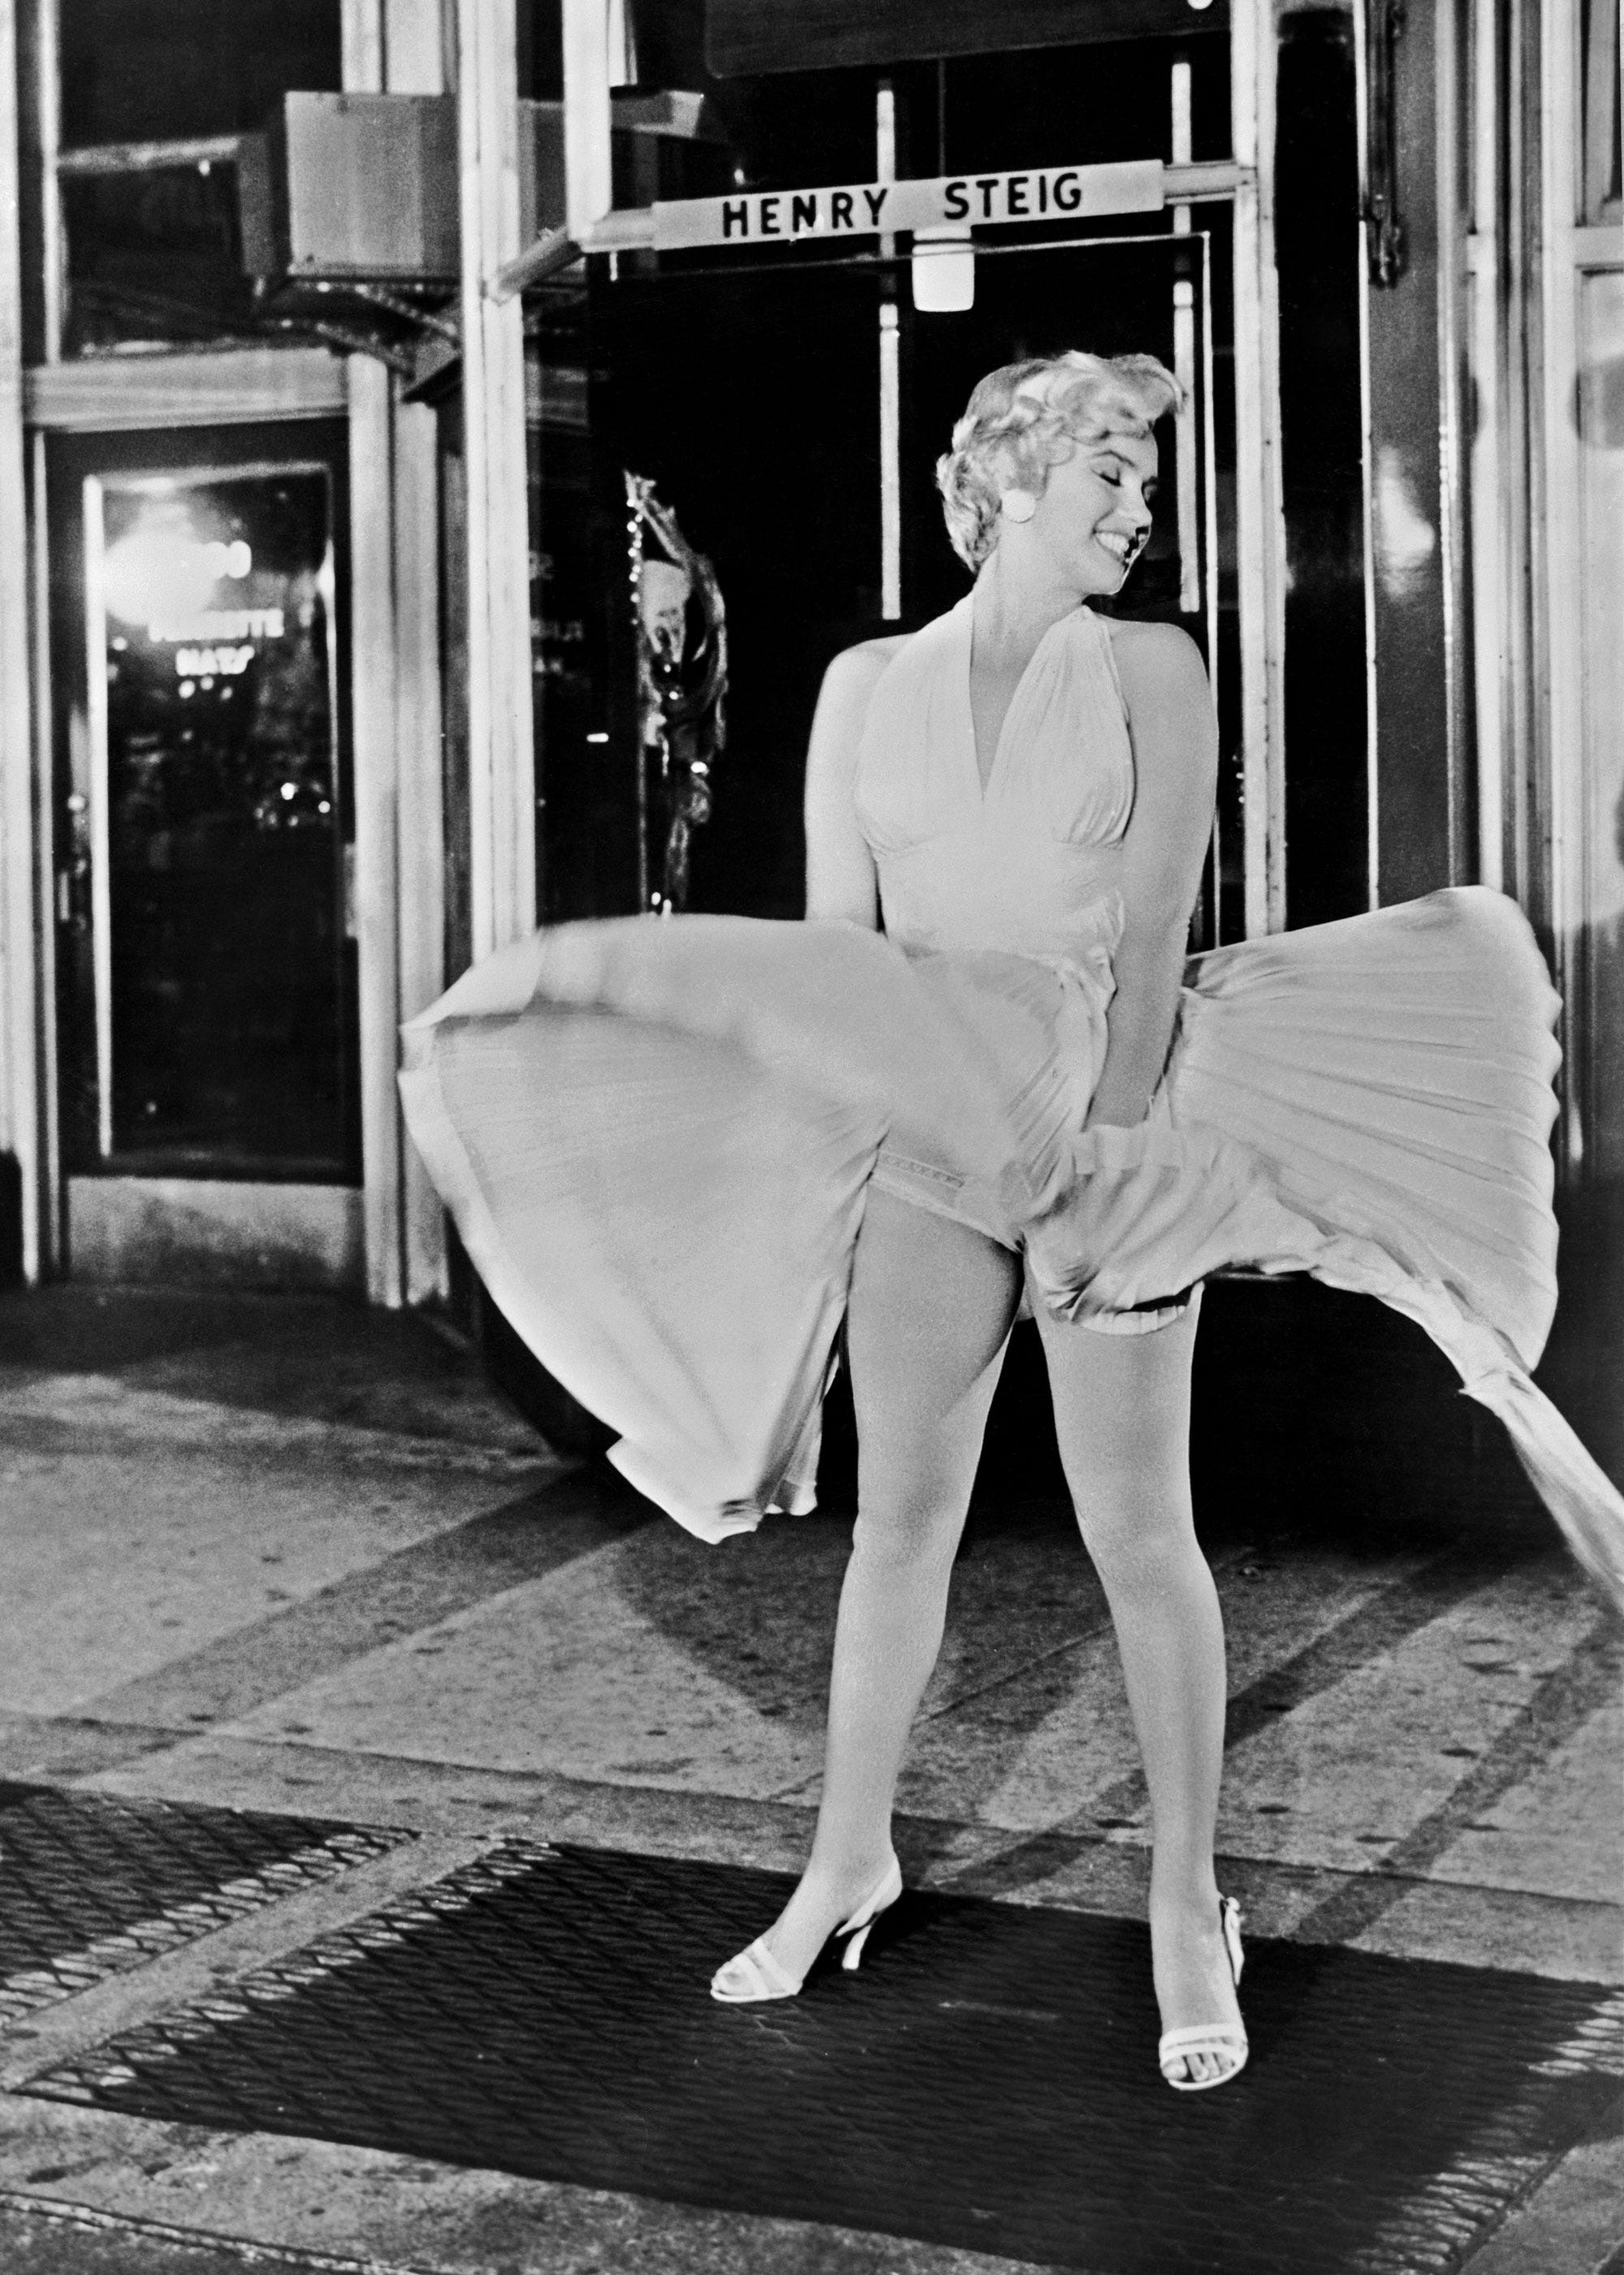 Nn Pre Upskirt - Skirts History Upskirting Upskirt Photos Gina Martin